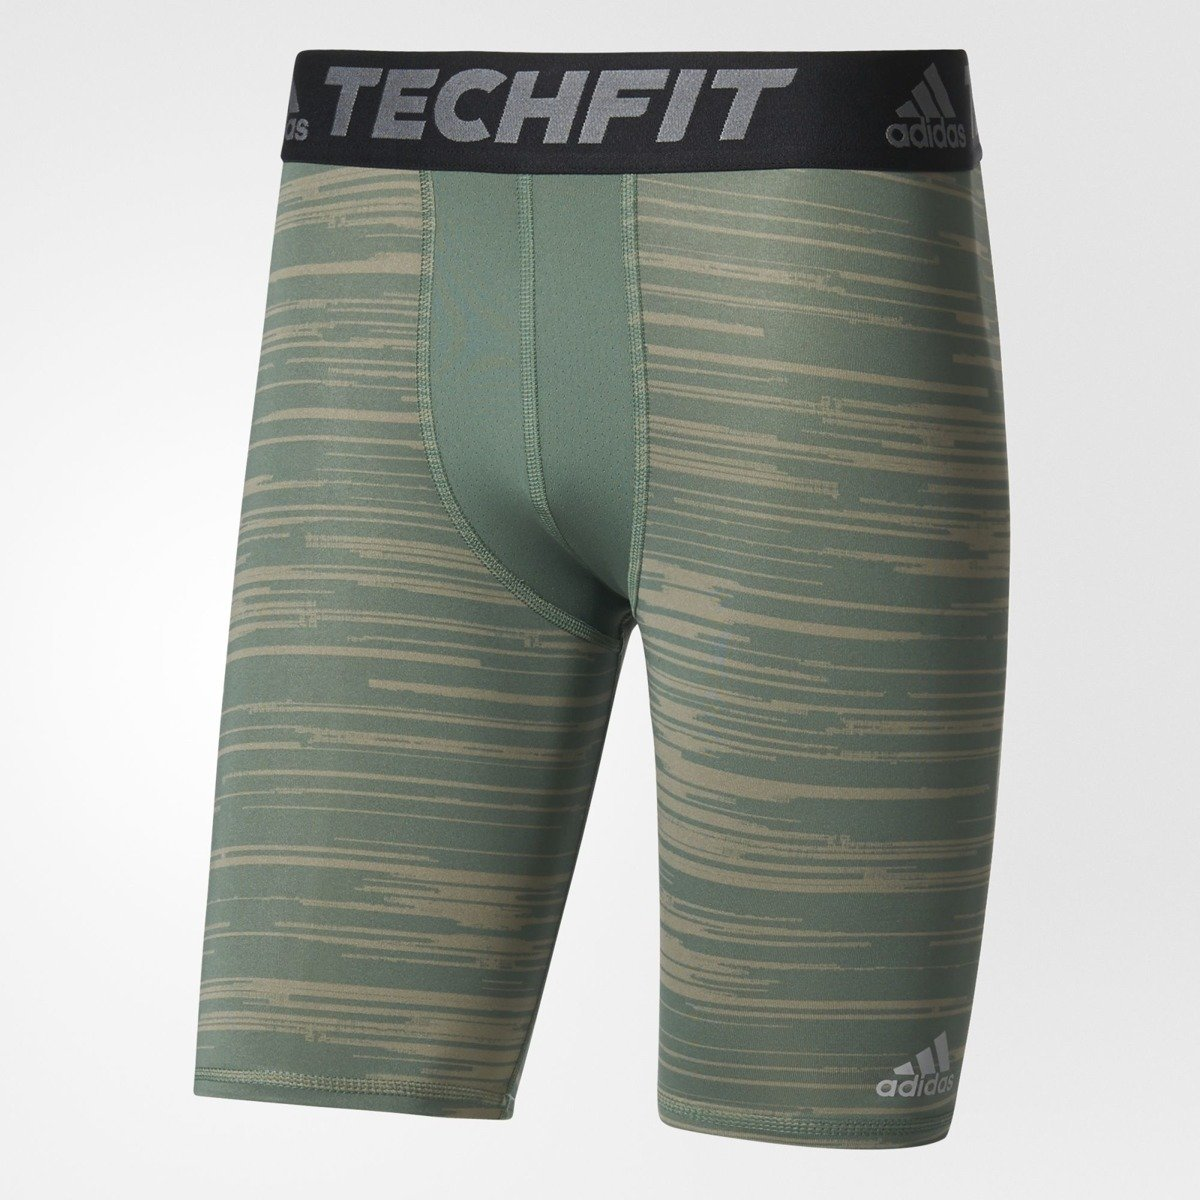 ... Adidas Techfit Base Graphic Short Tights Trace Green - BK3561 ...